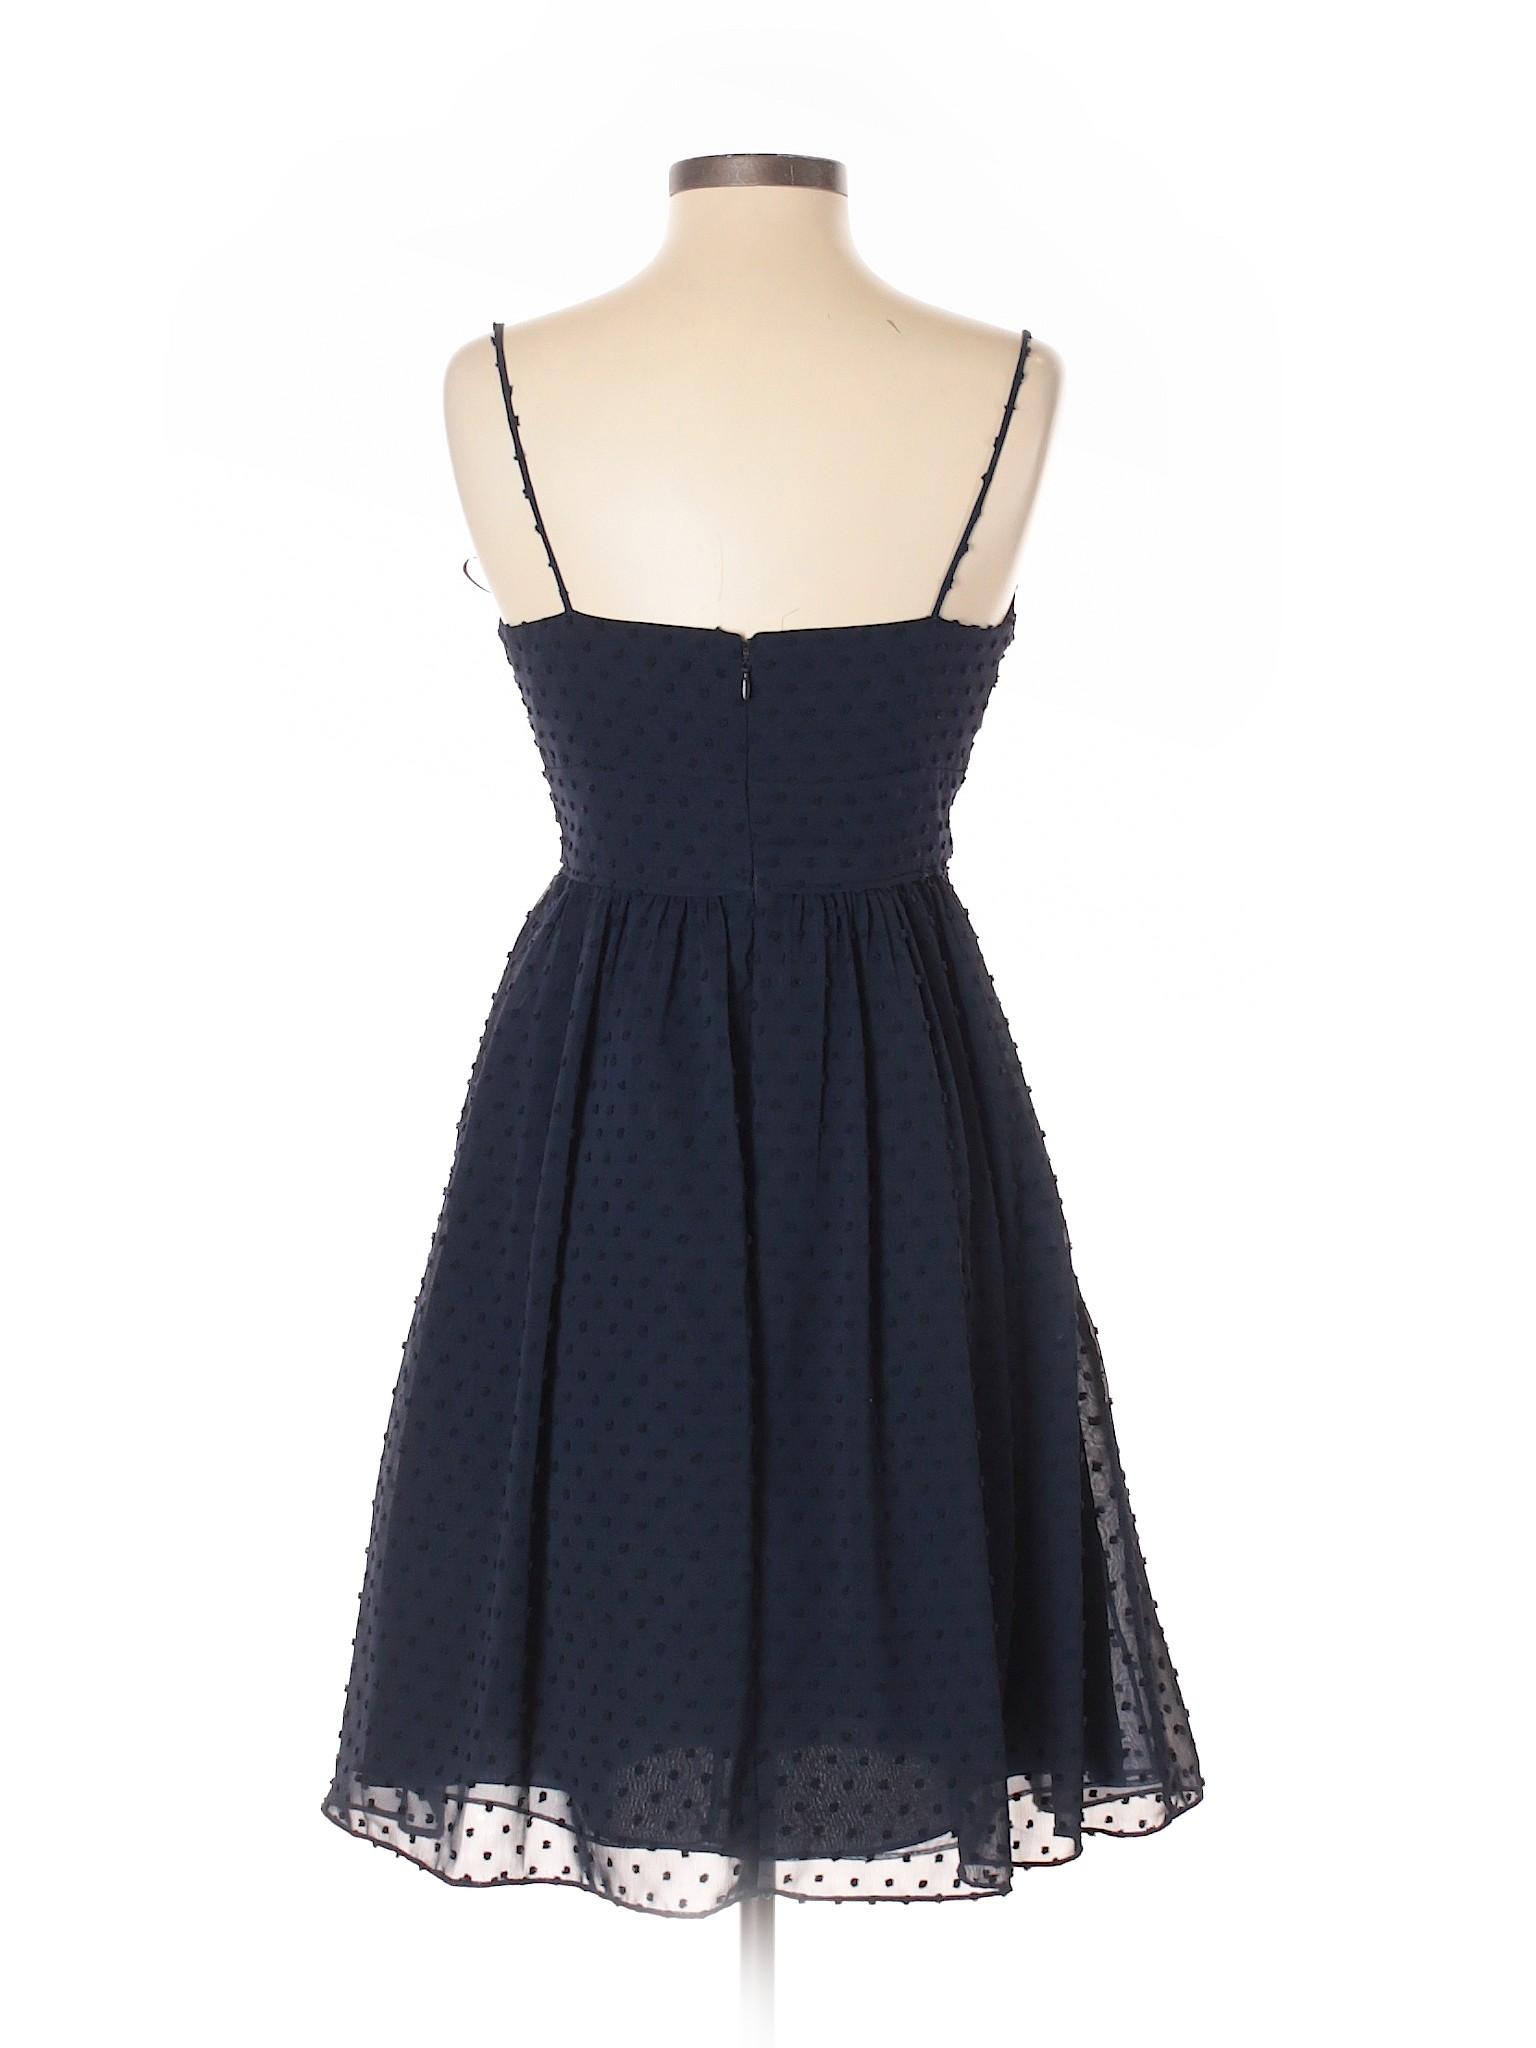 Boutique J Crew Winter Casual Dress 0rnZ0qY